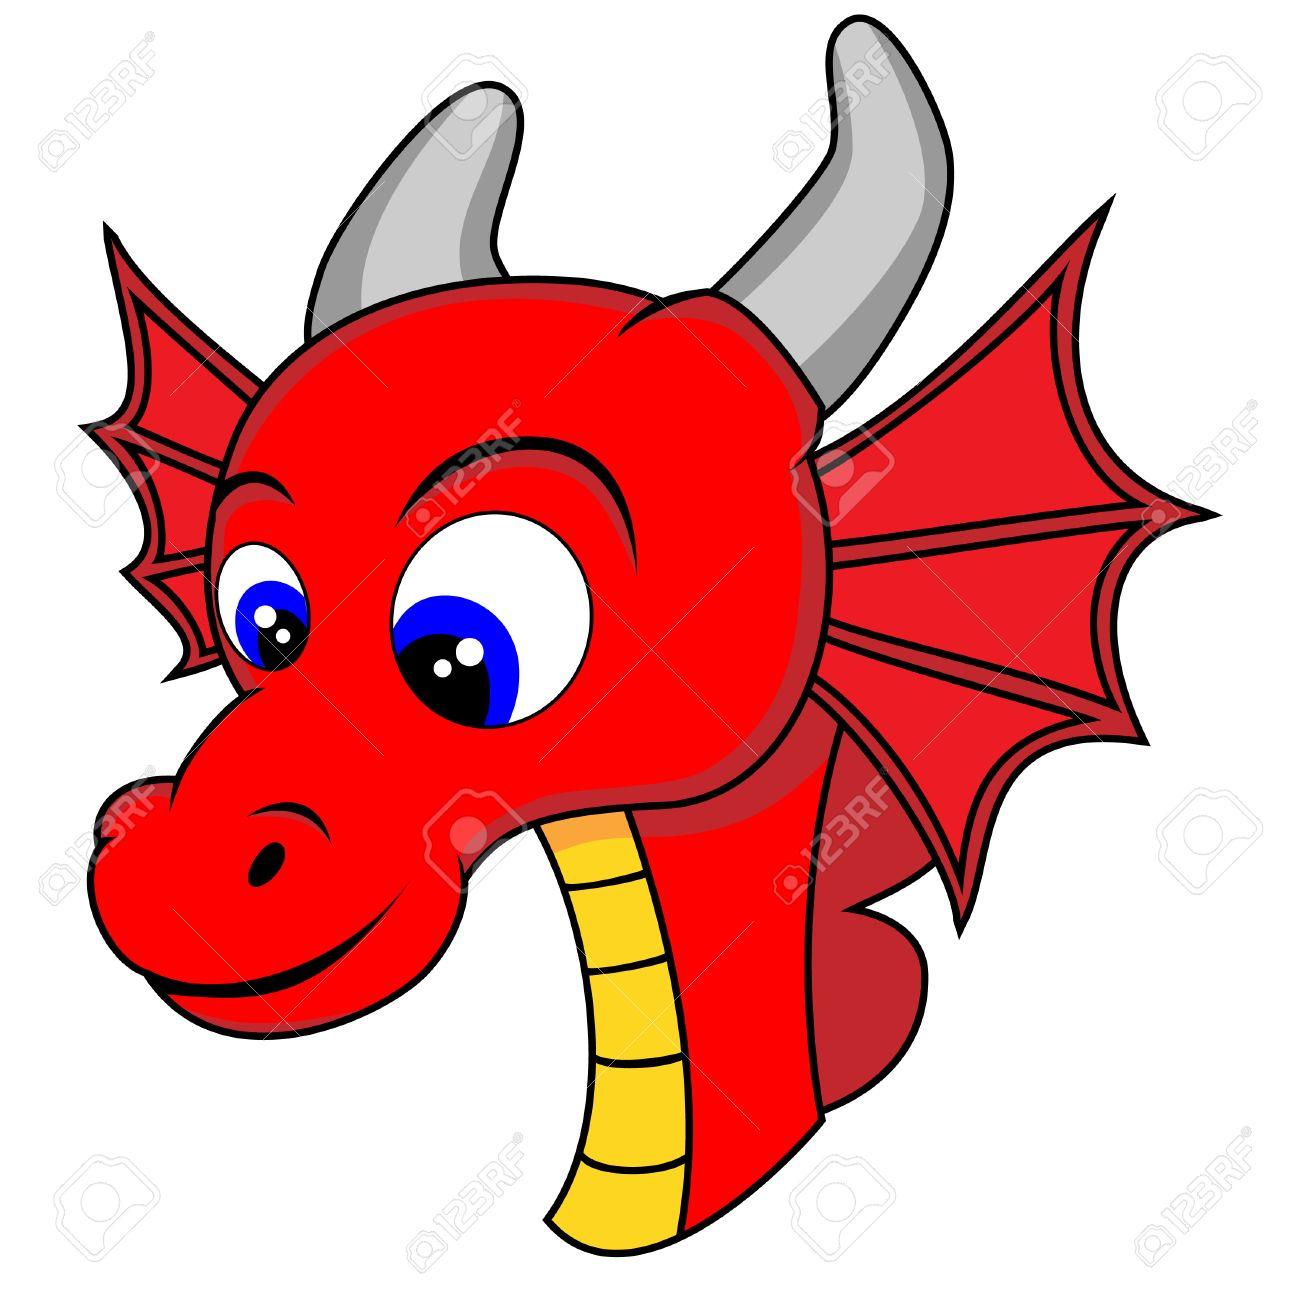 cute dragon head royalty free cliparts vectors and stock